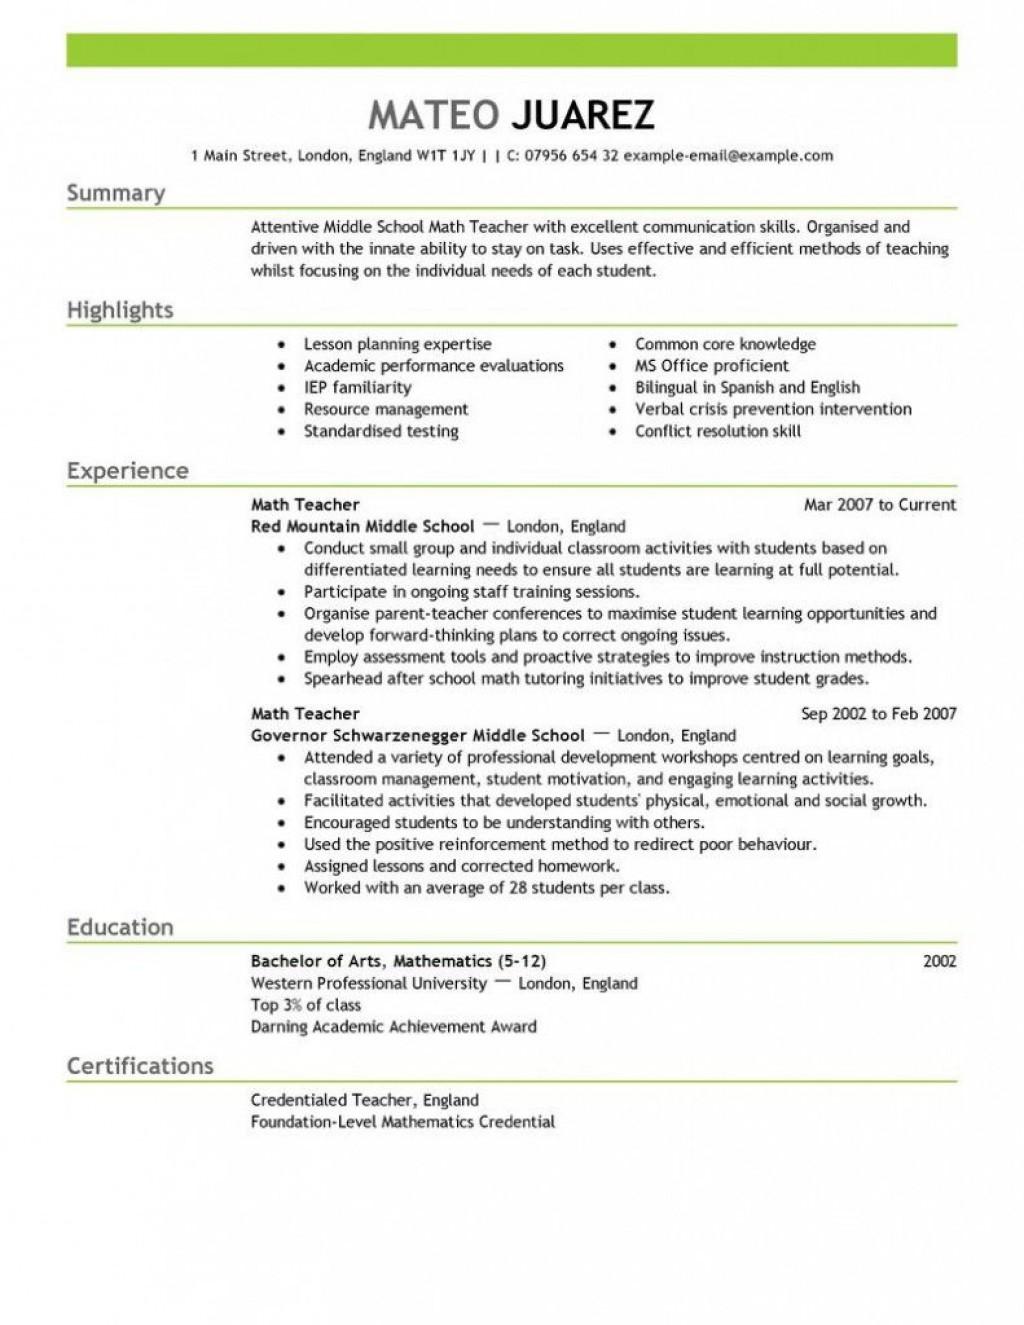 007 Sensational Teacher Resume Template Free Photo  Cv Word Download Editable Format DocLarge